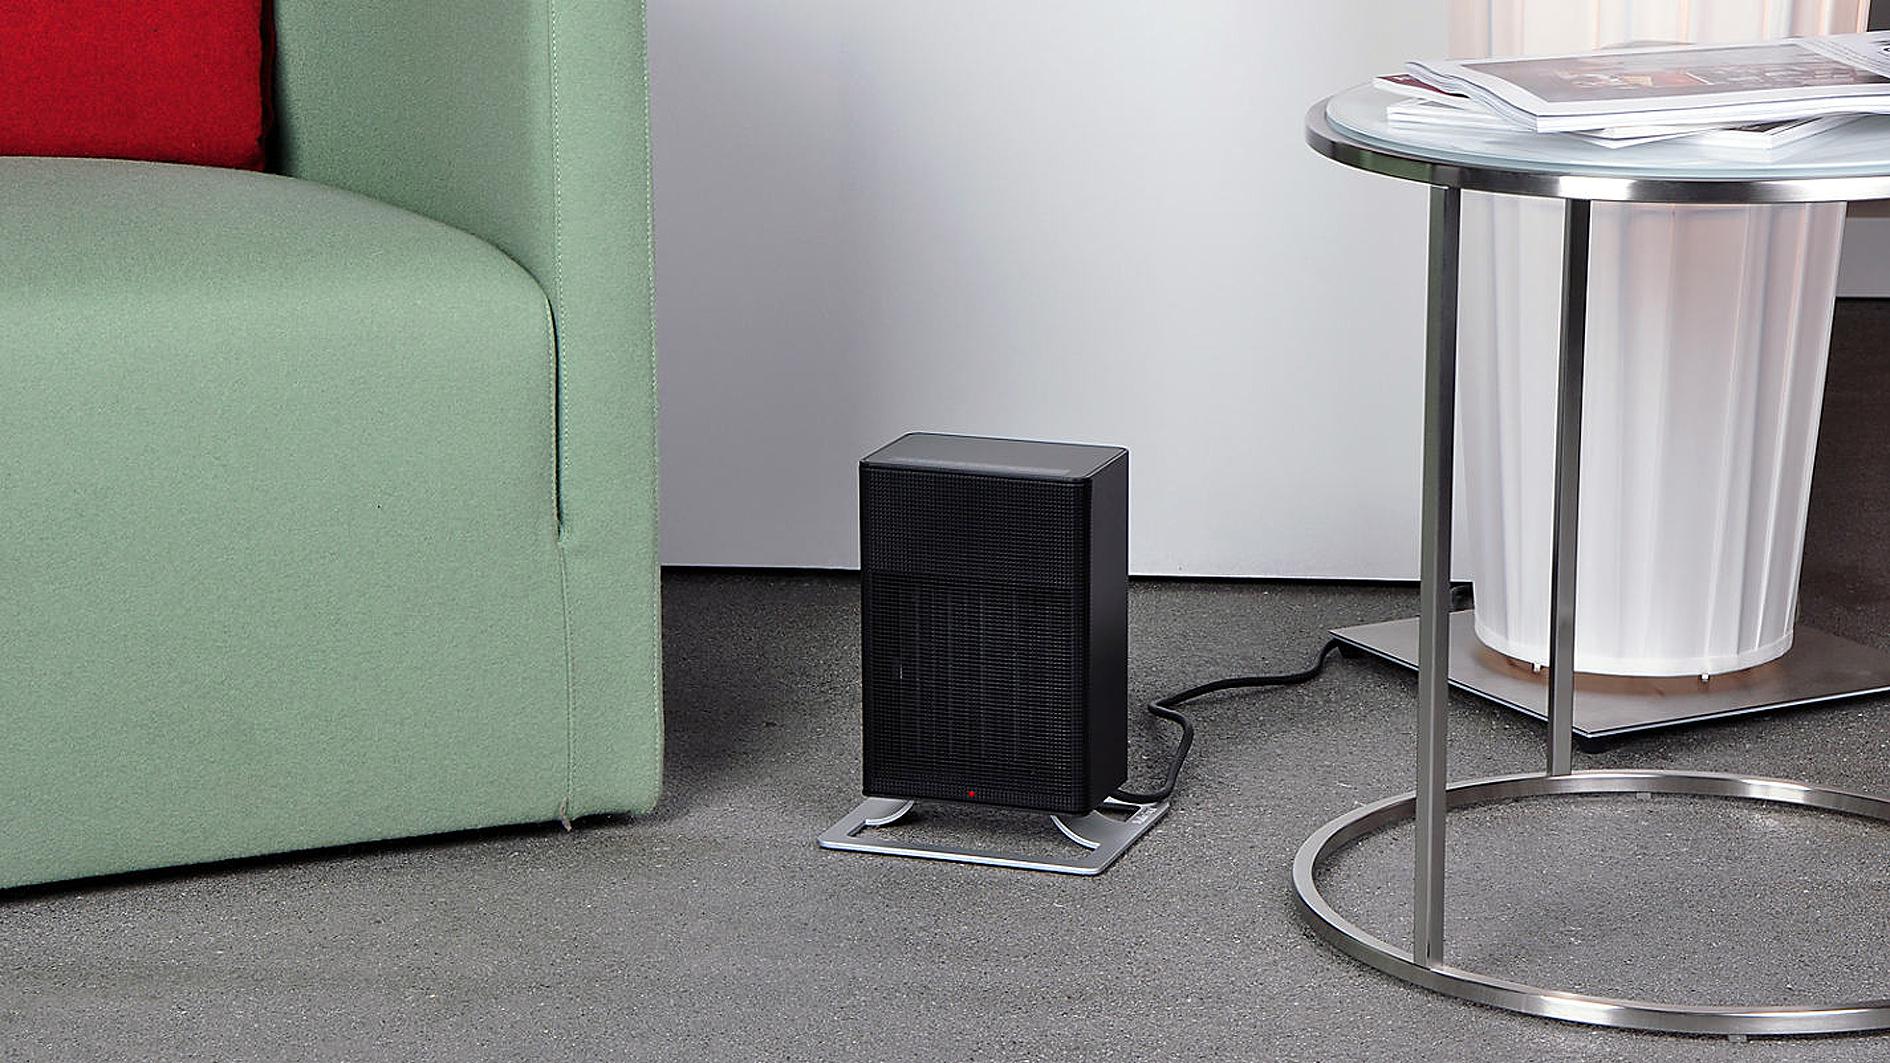 Focus heater has a motion sensor that